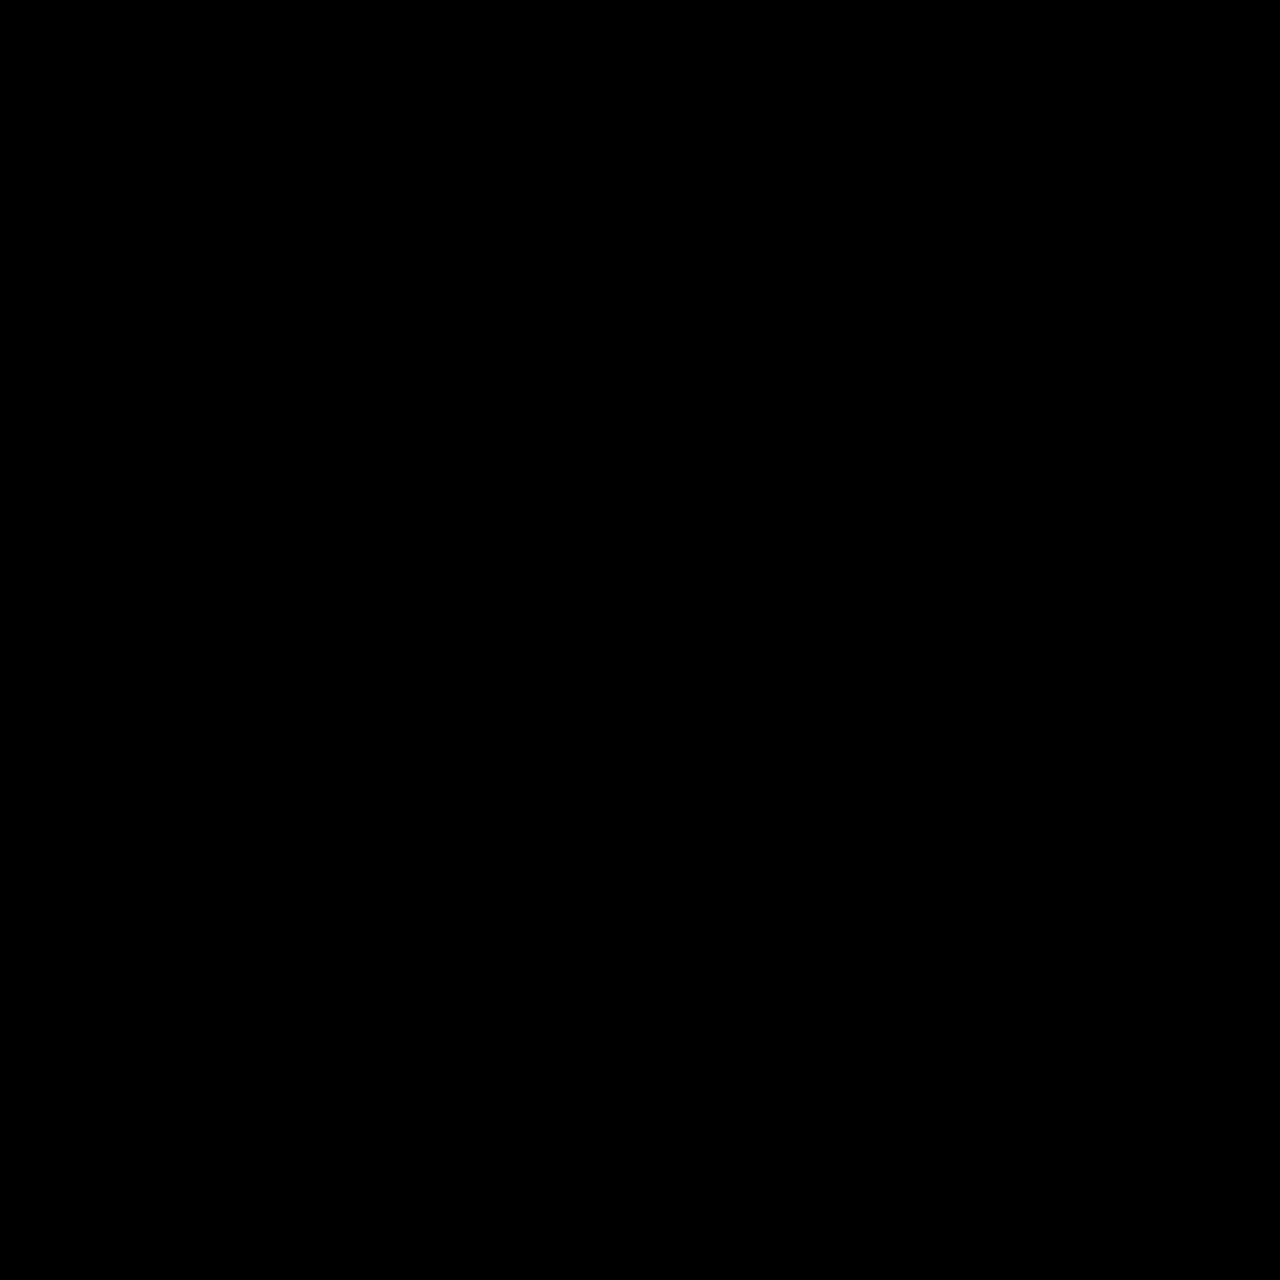 LUMINARIA SOLAR 90W